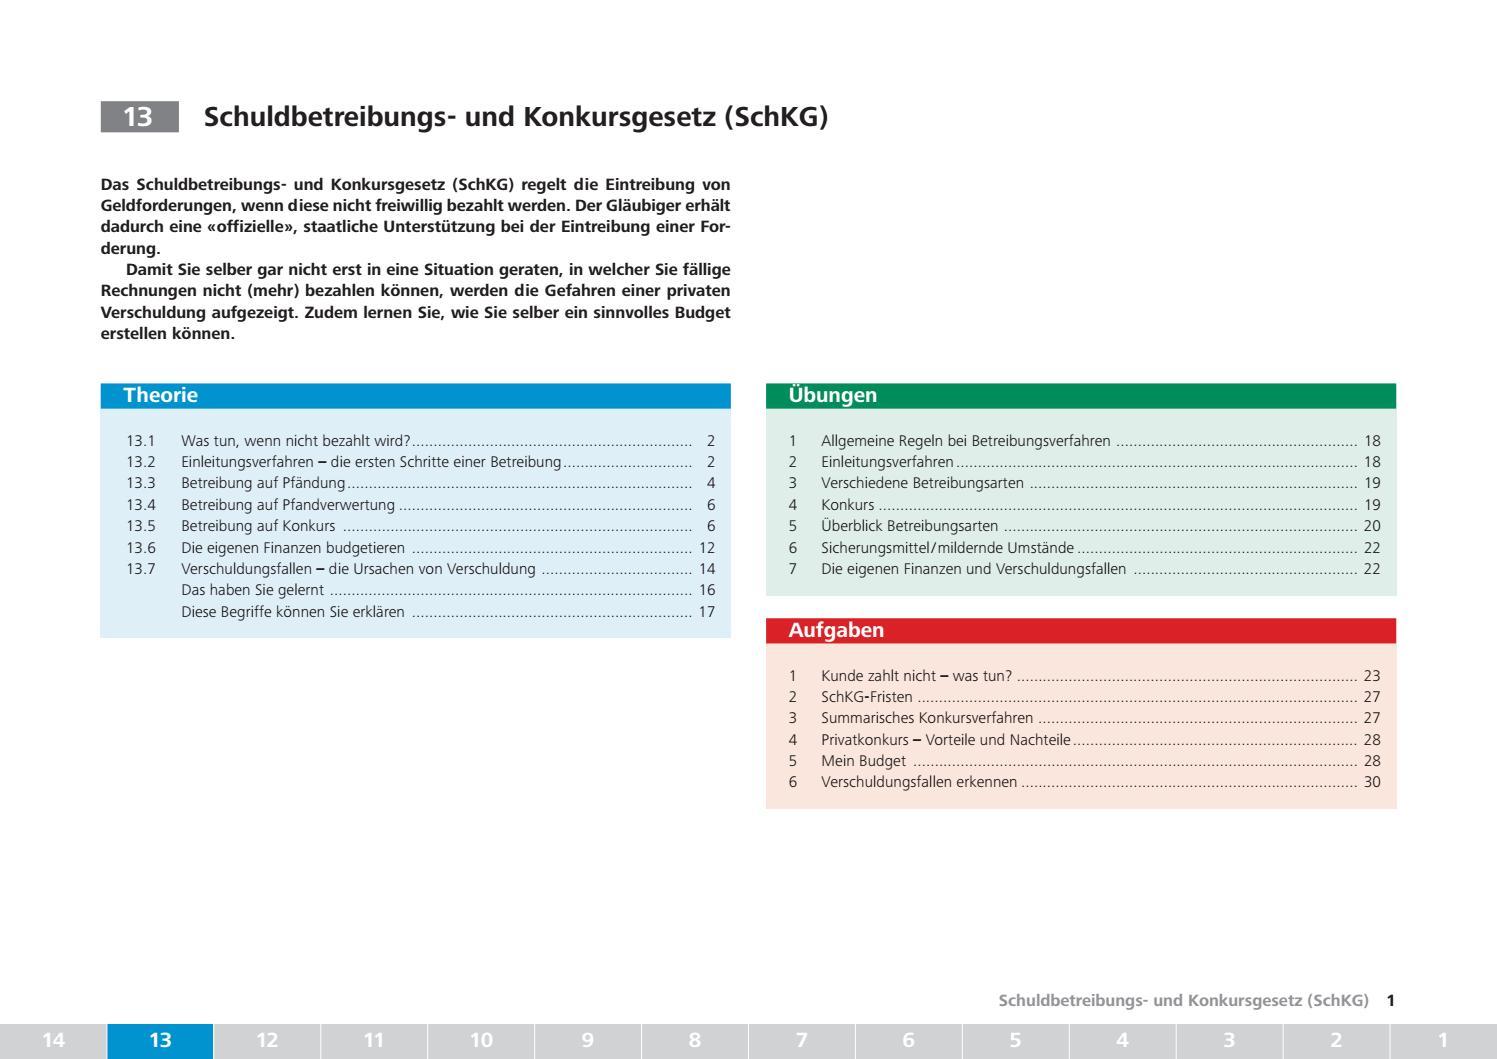 Charmant Filmskriptumrissvorlage Fotos - Entry Level Resume Vorlagen ...